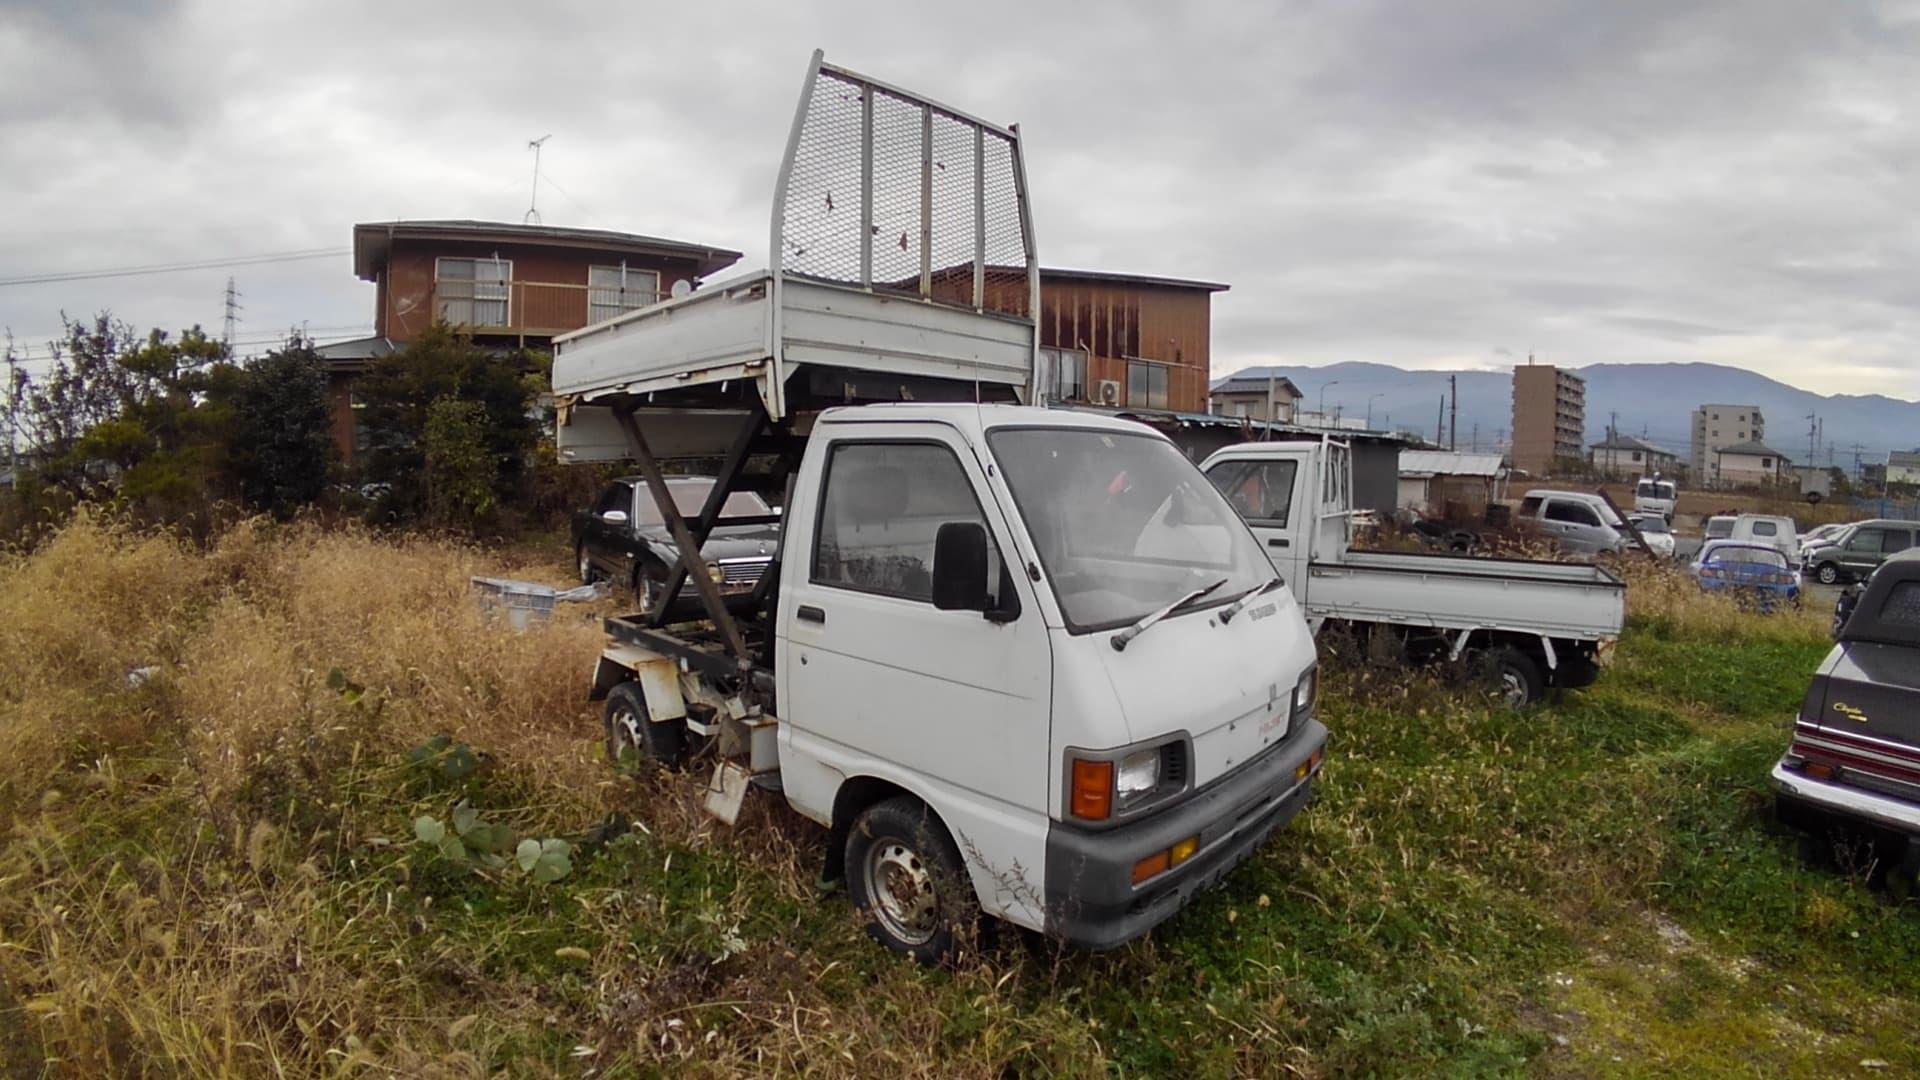 Daihatsu Hijet Climber 4WD - Scissor Lift